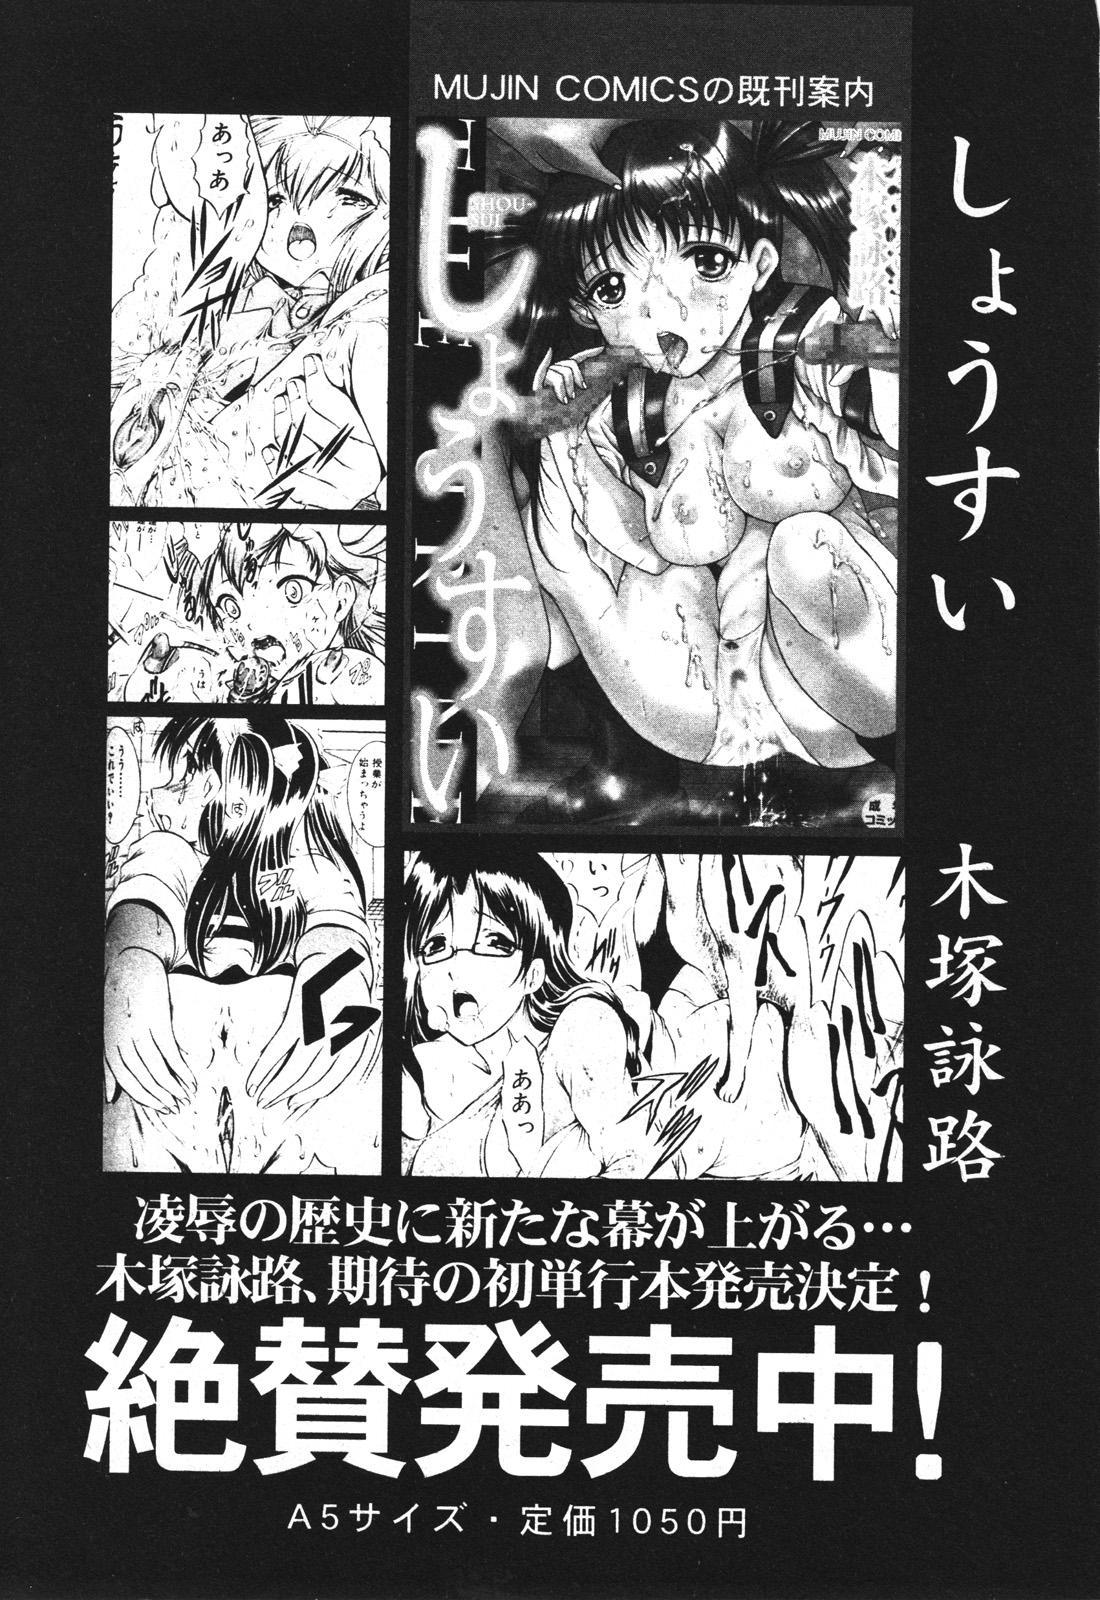 BUSTER COMIC 2010-05 Vol.07 287